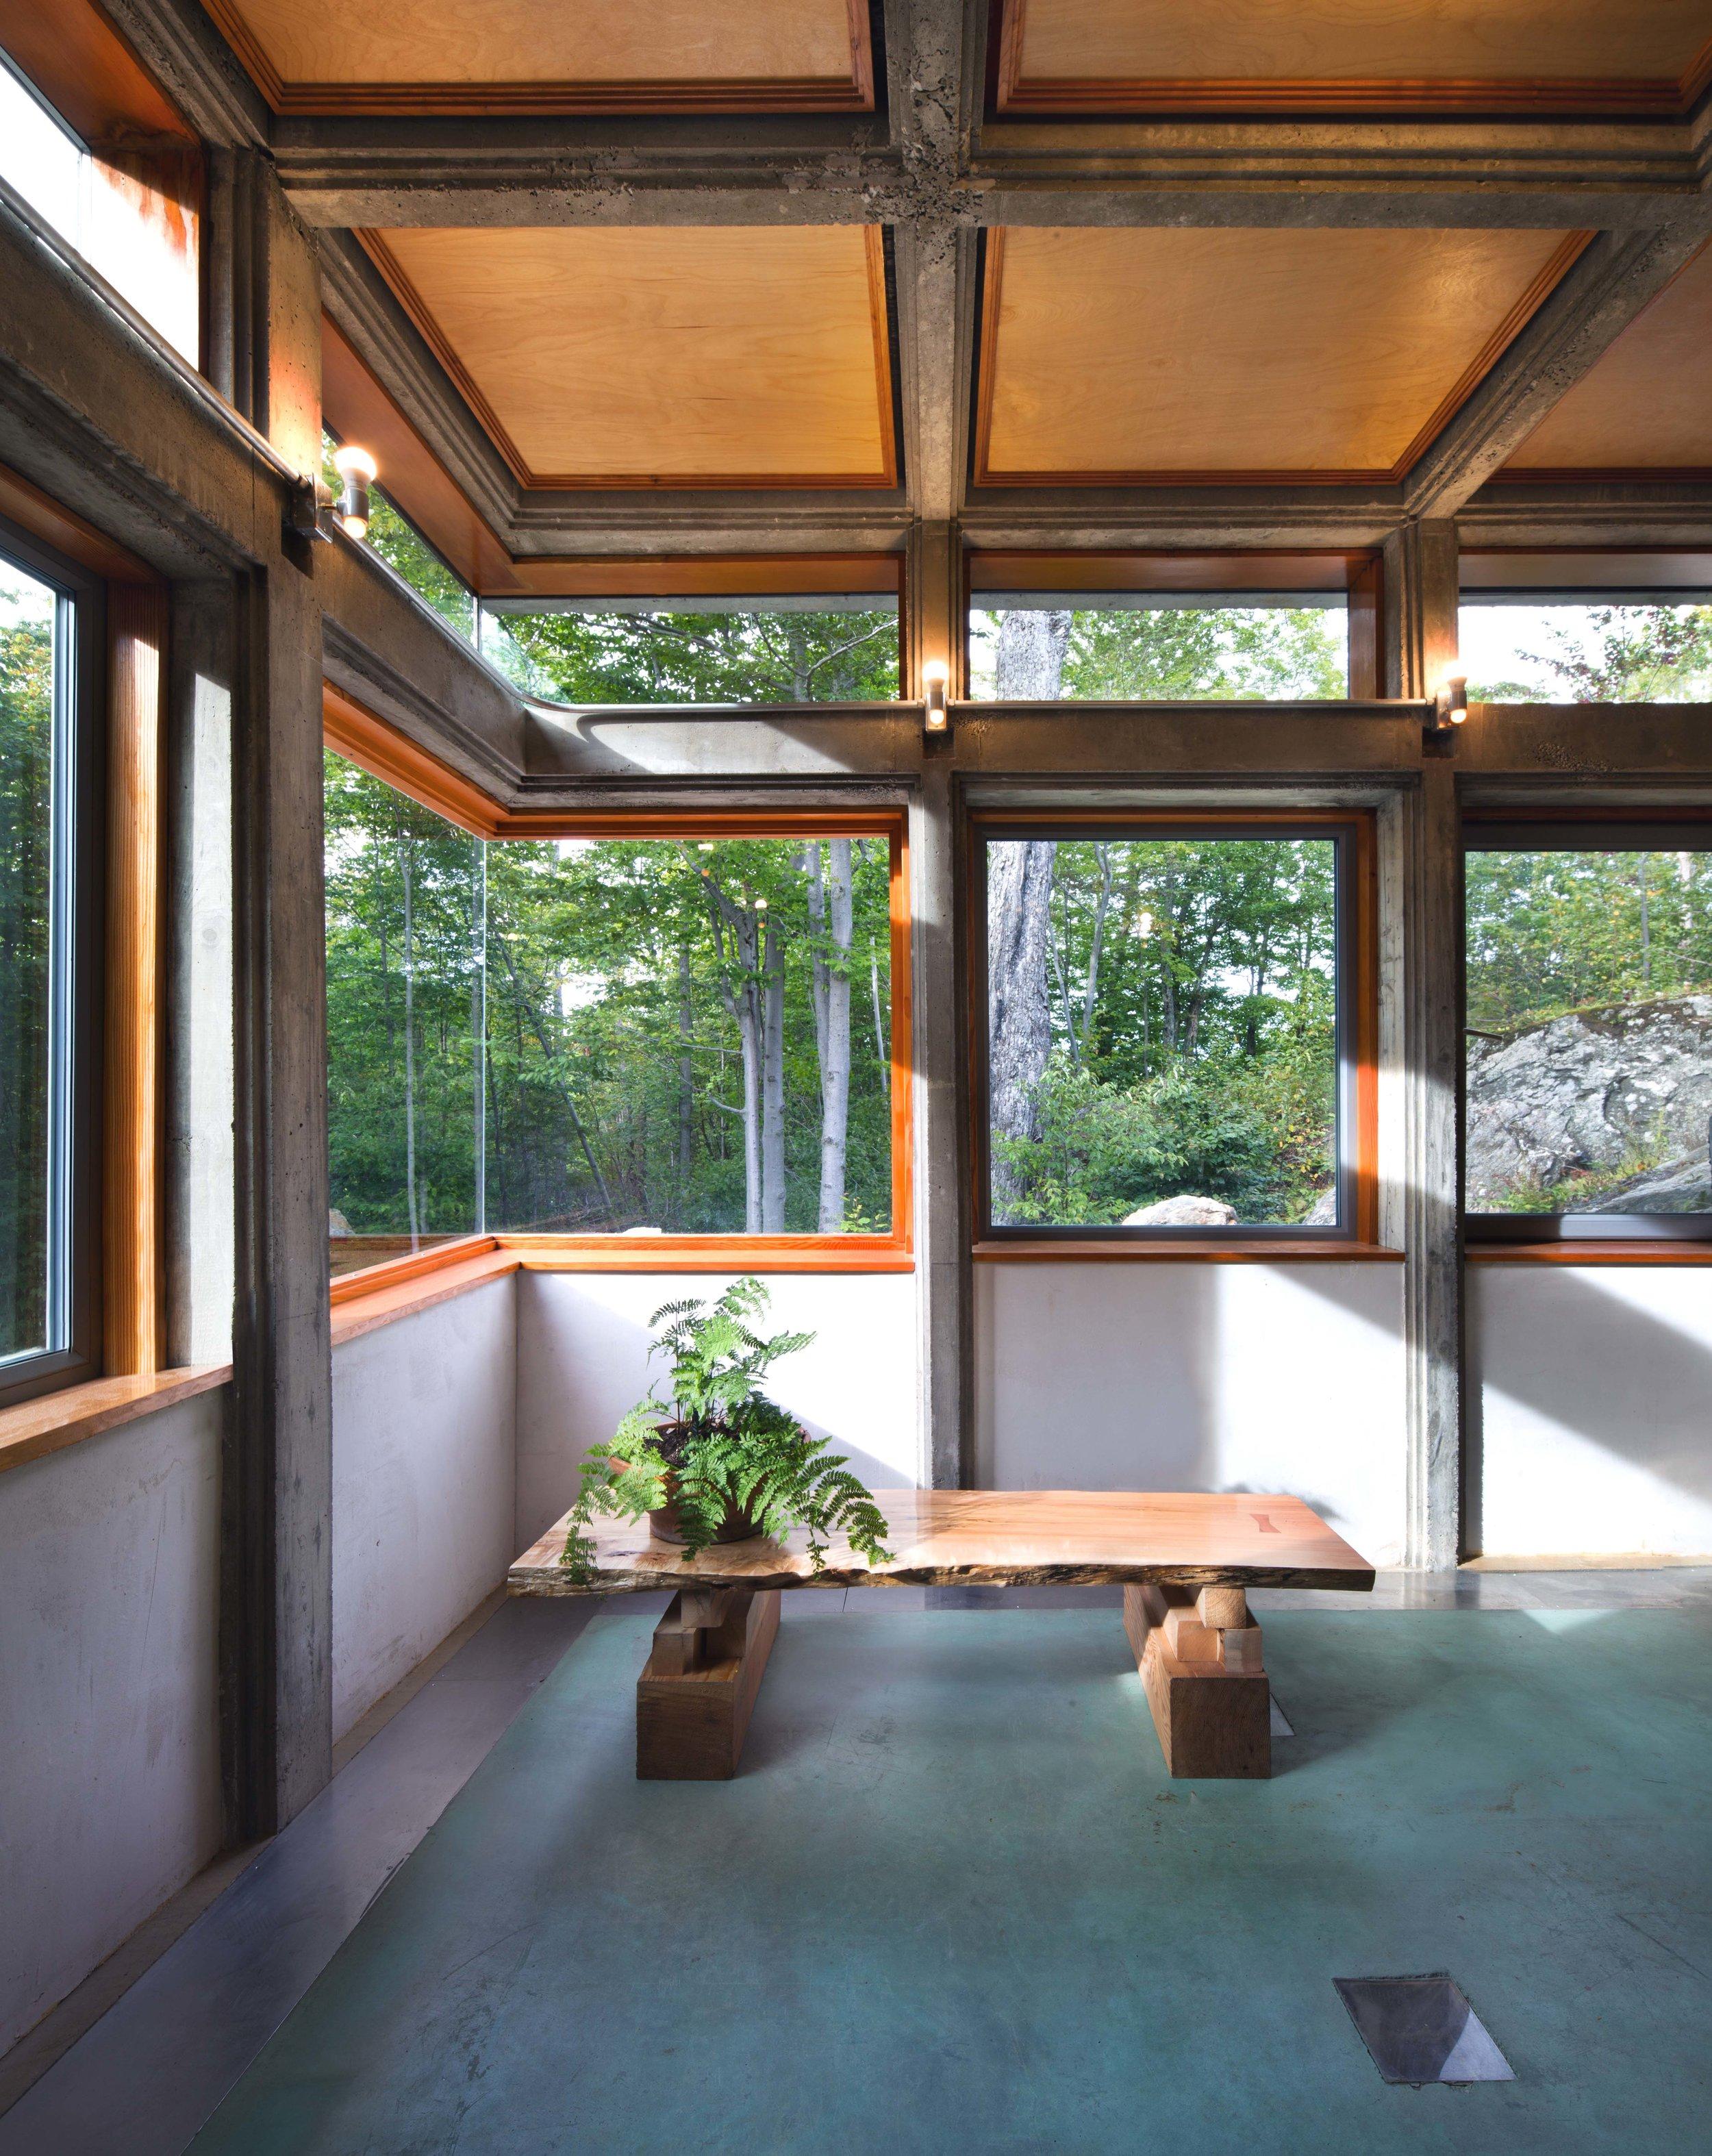 Home Run House-7389 Bedroom Corner Window.jpg